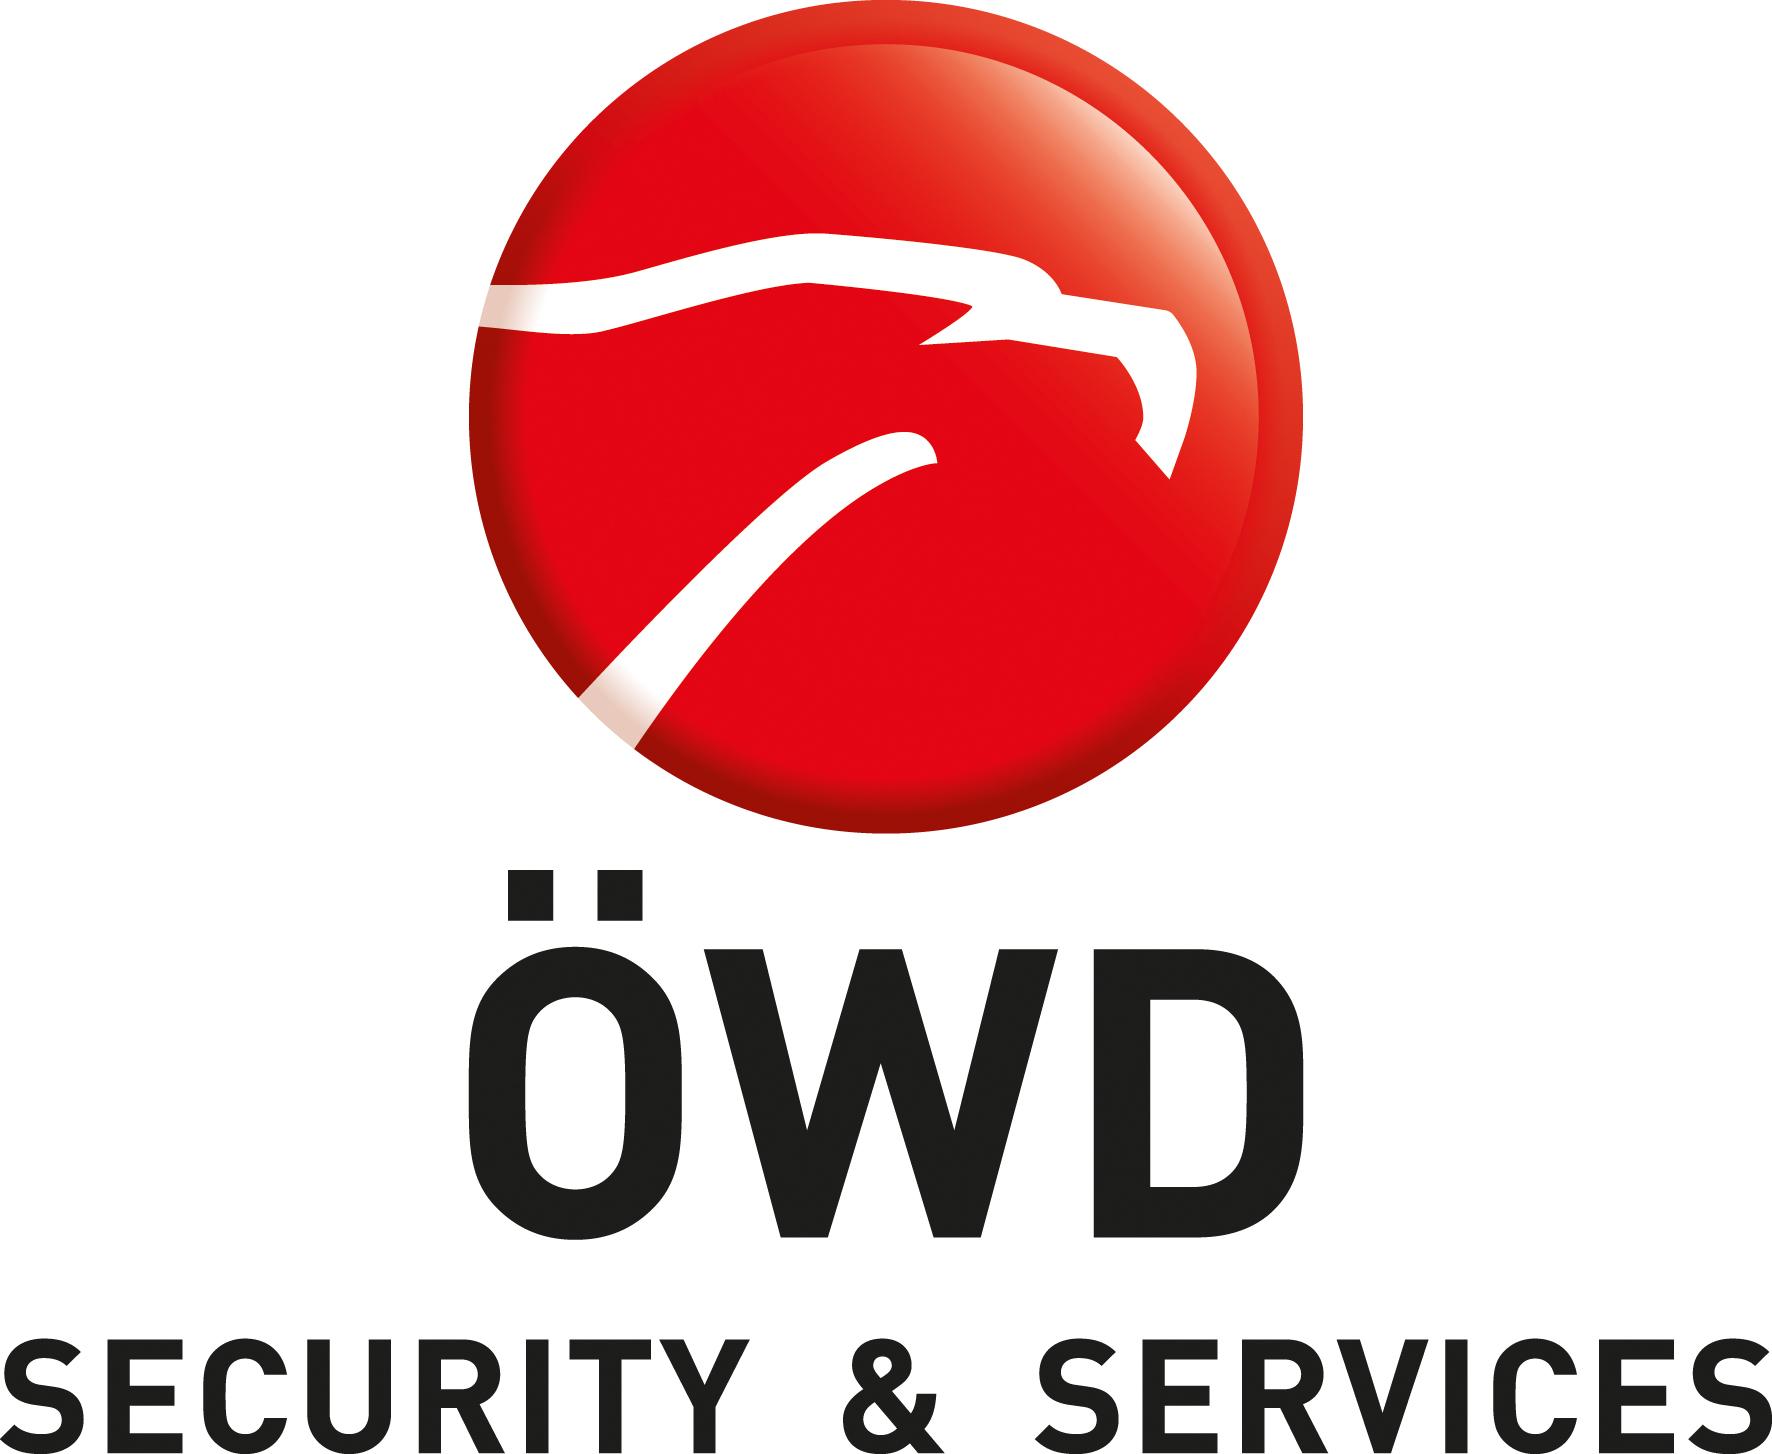 OEWD11_Logovarianten_24_Auswahl